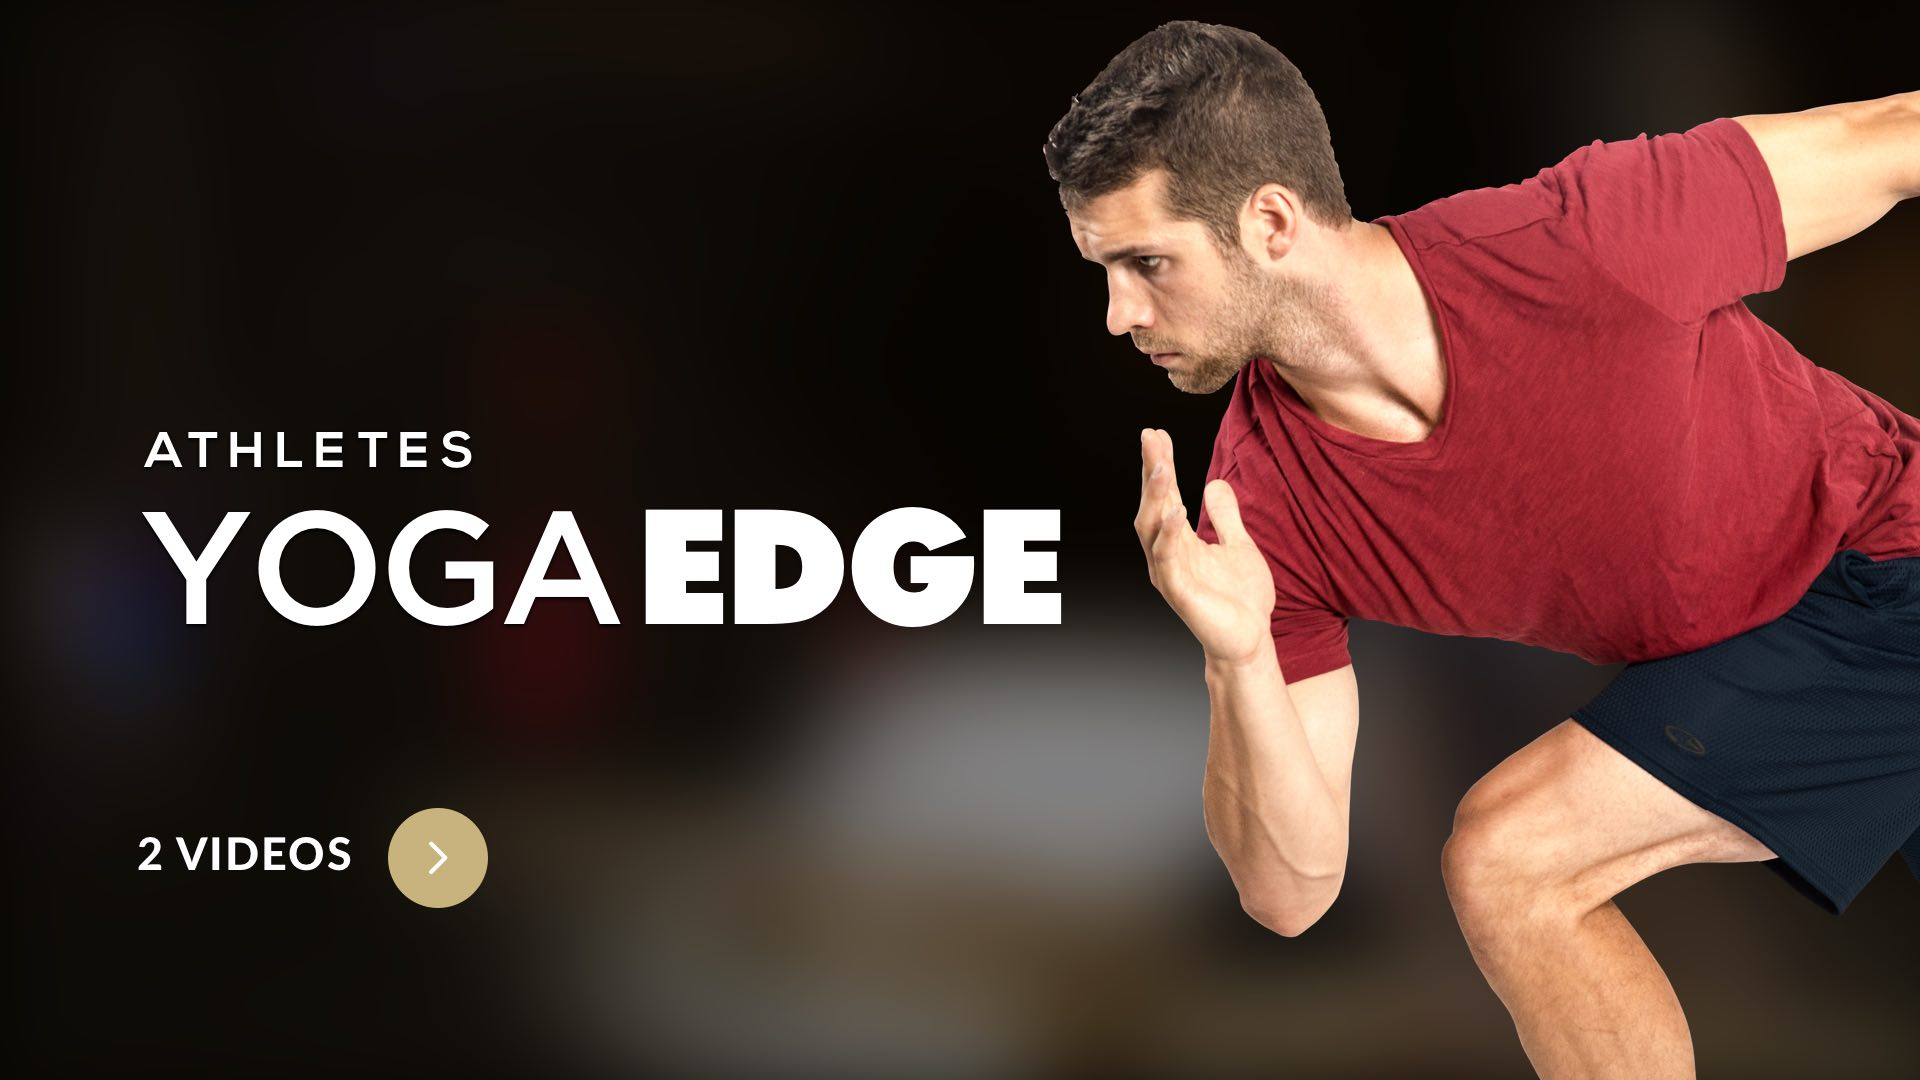 Yoga Edge